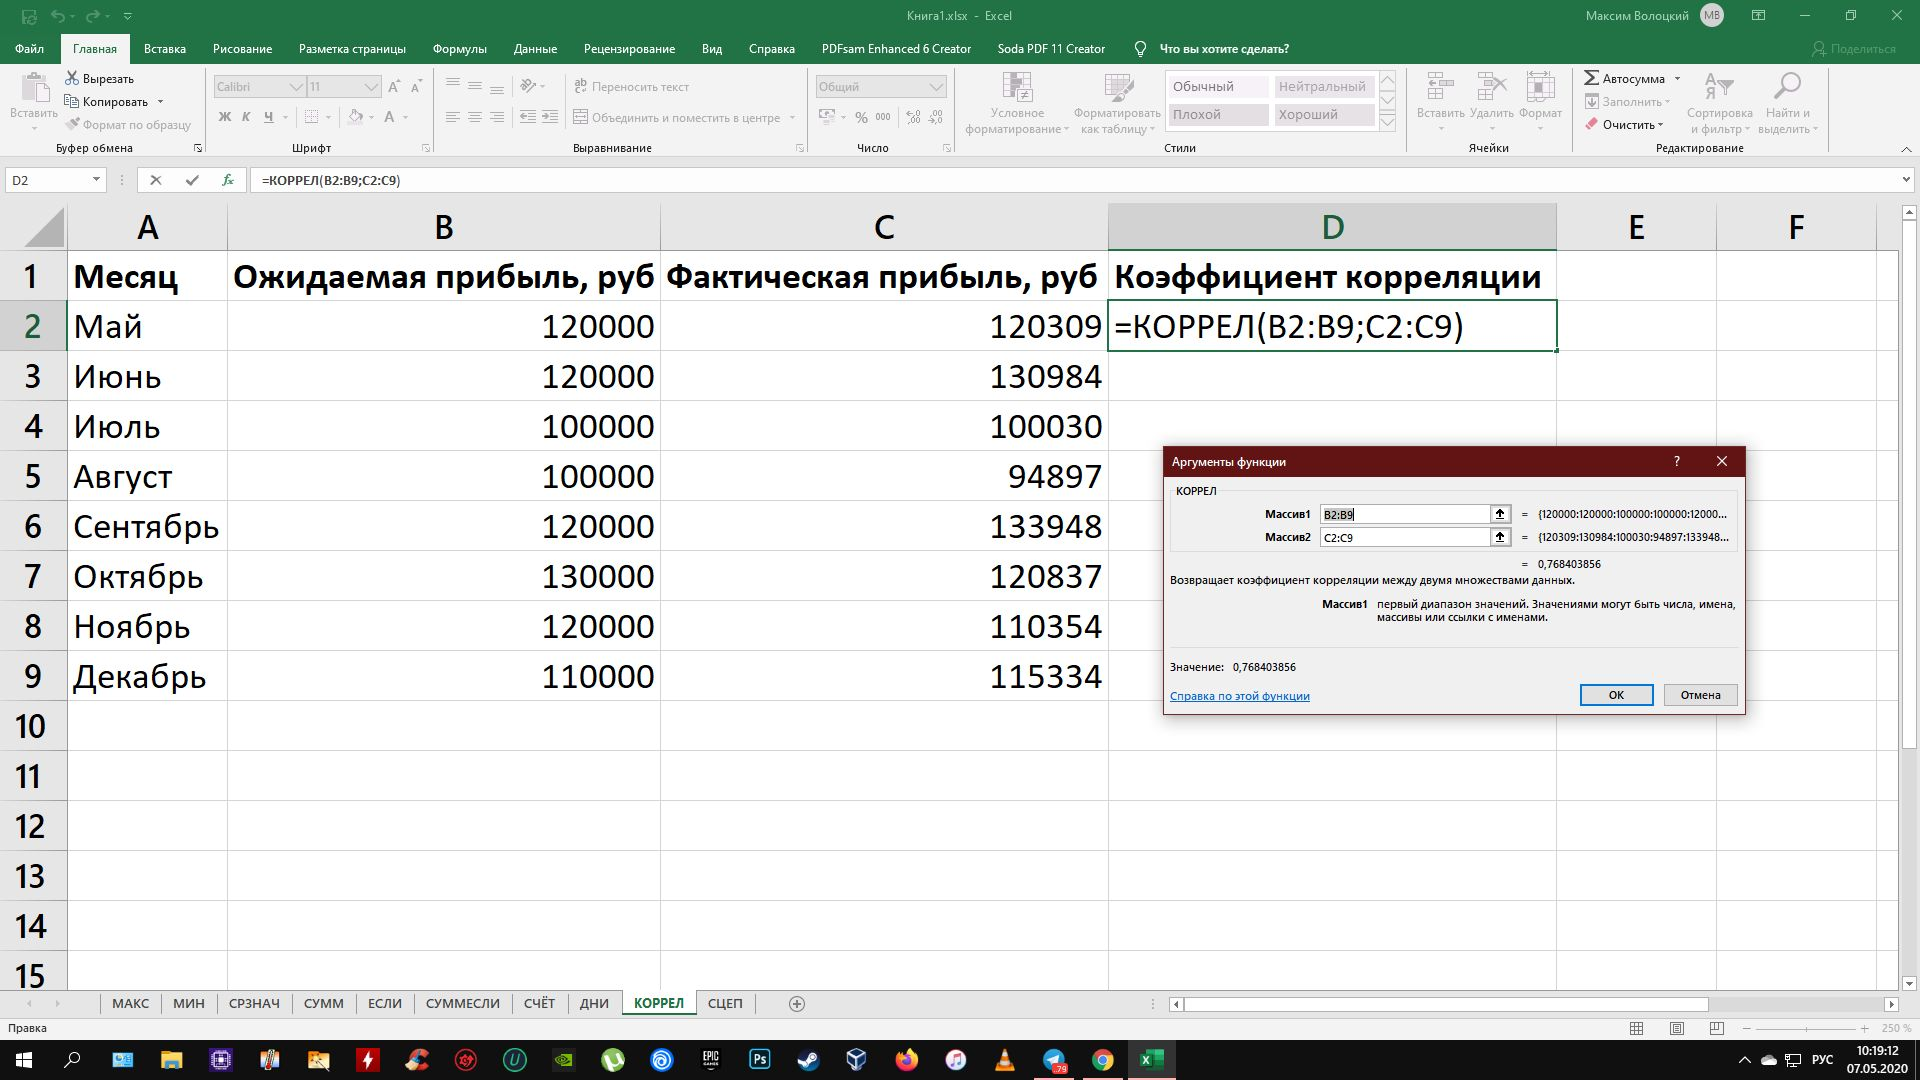 10 formul v excel yak polegshat vam zhittya 9 - 10 формул в Excel, які полегшать вам життя